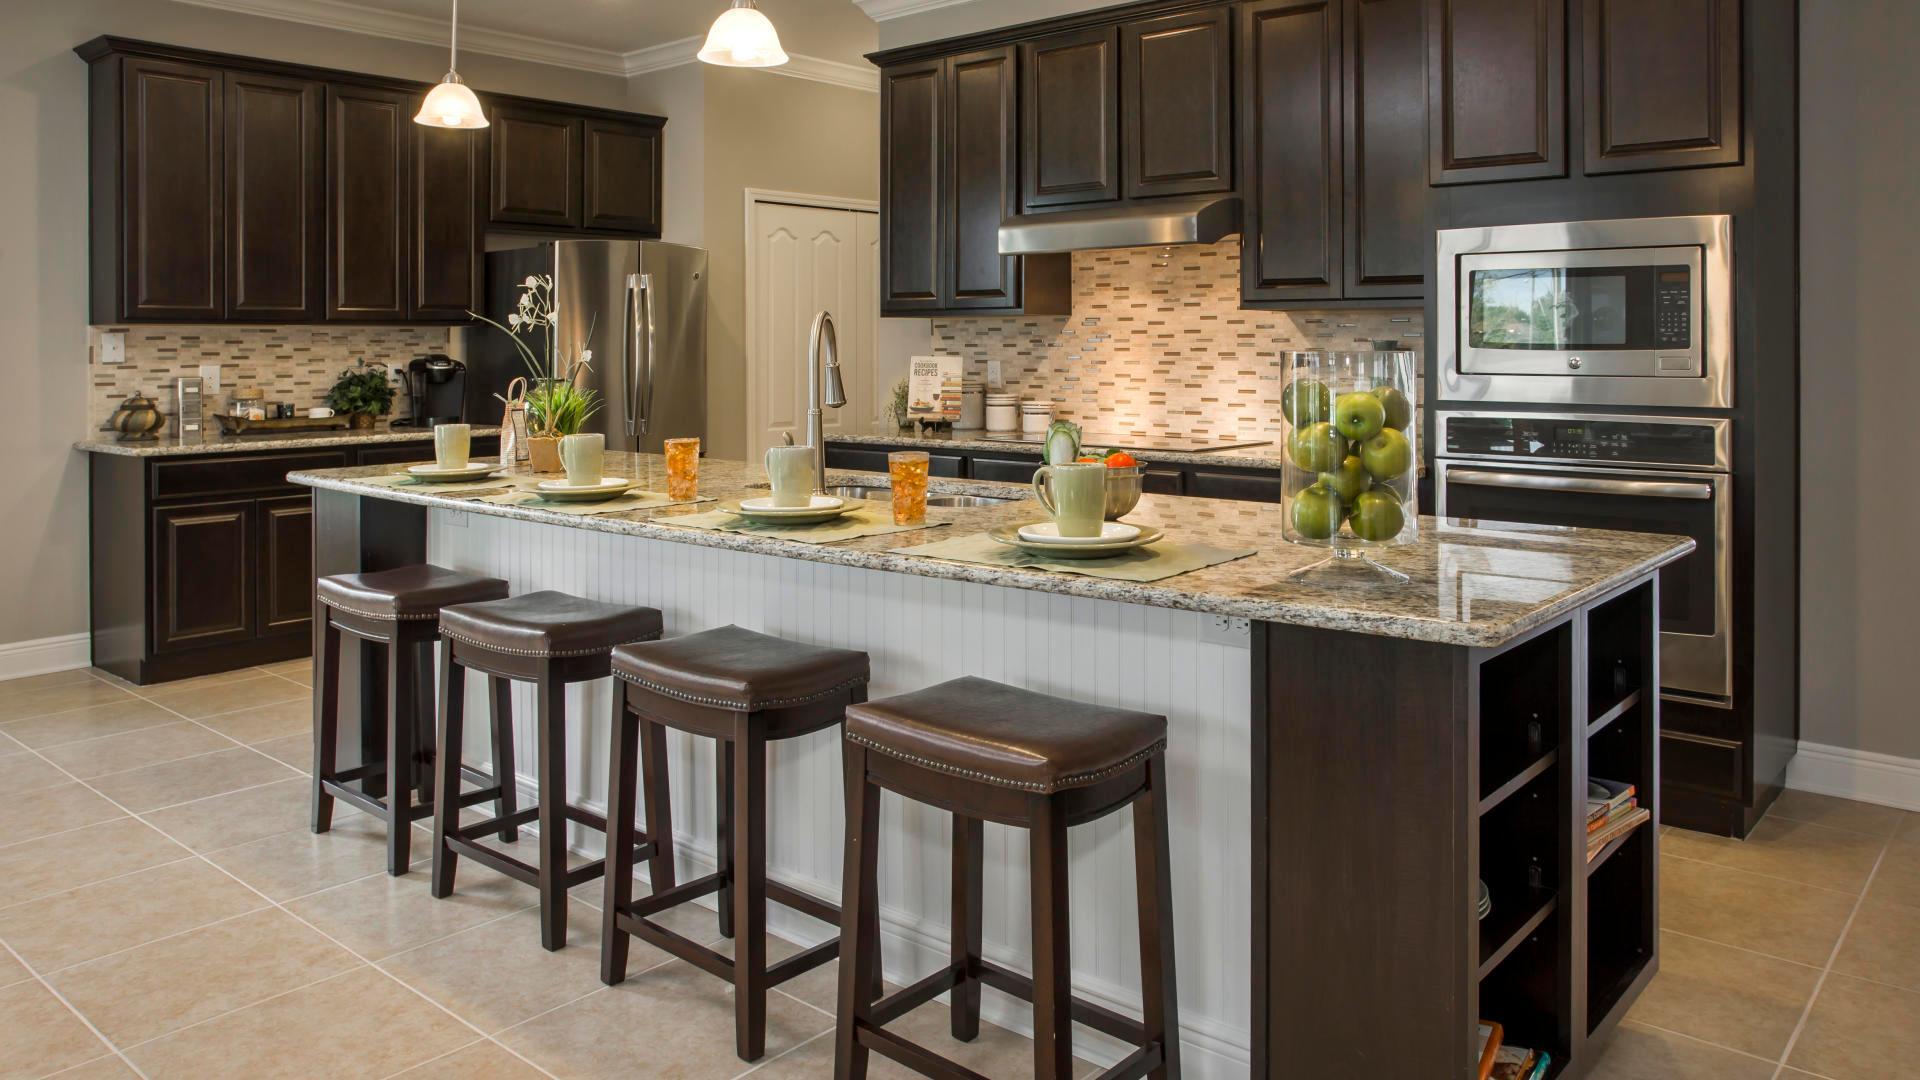 Kitchen featured in the Drexel By Maronda Homes in Daytona Beach, FL